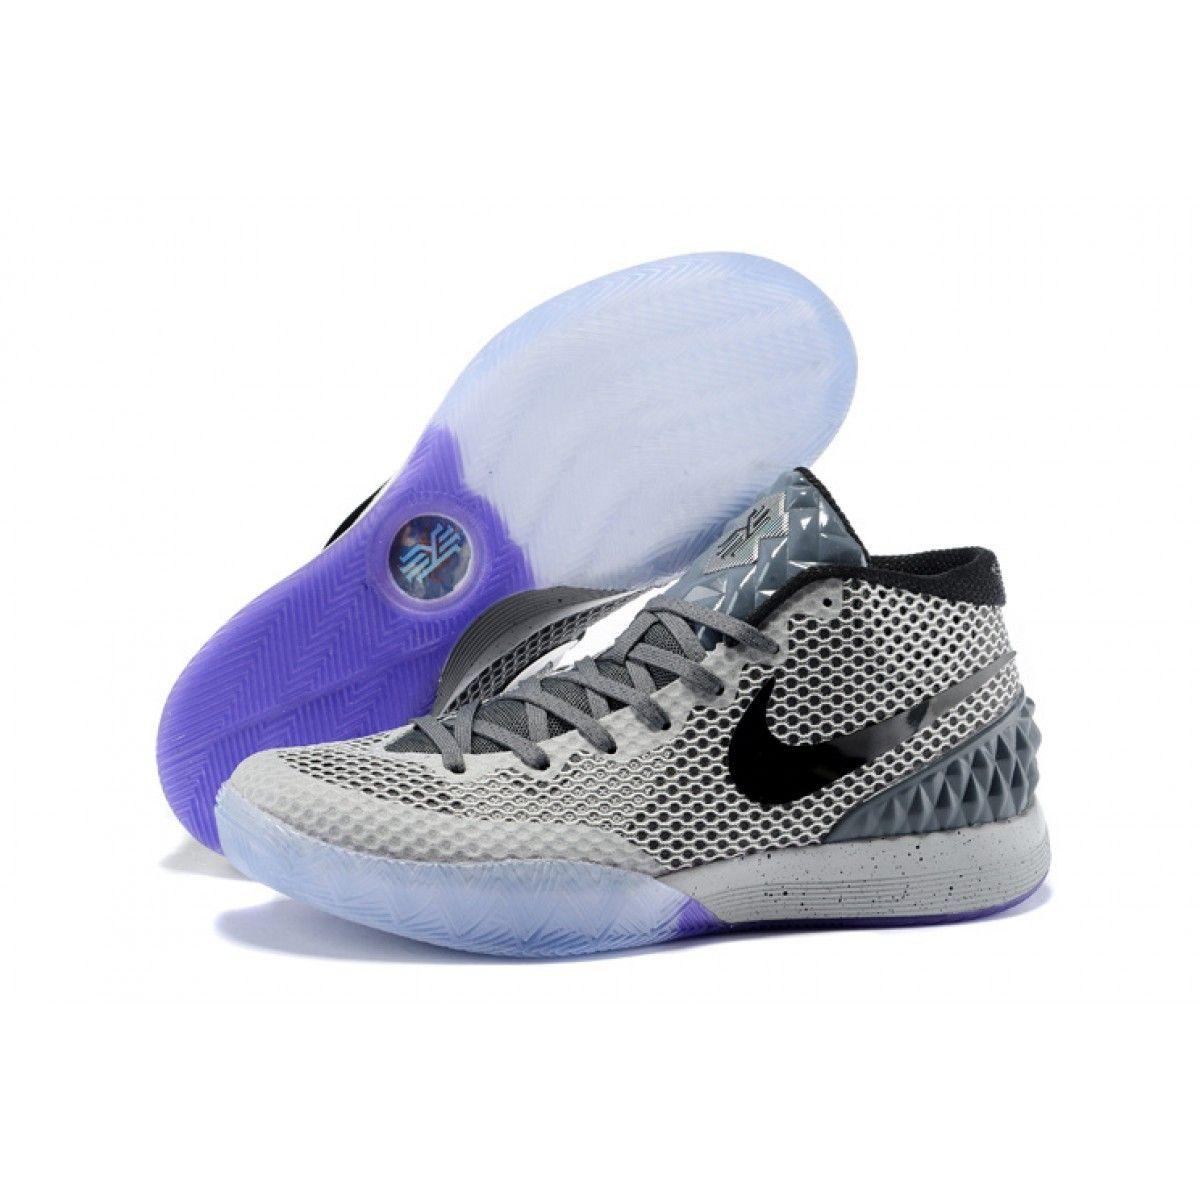 eb31bda2c659 coupon code nike kyrie 1 2015 grey black purple basketball shoes 65a72 6f75e